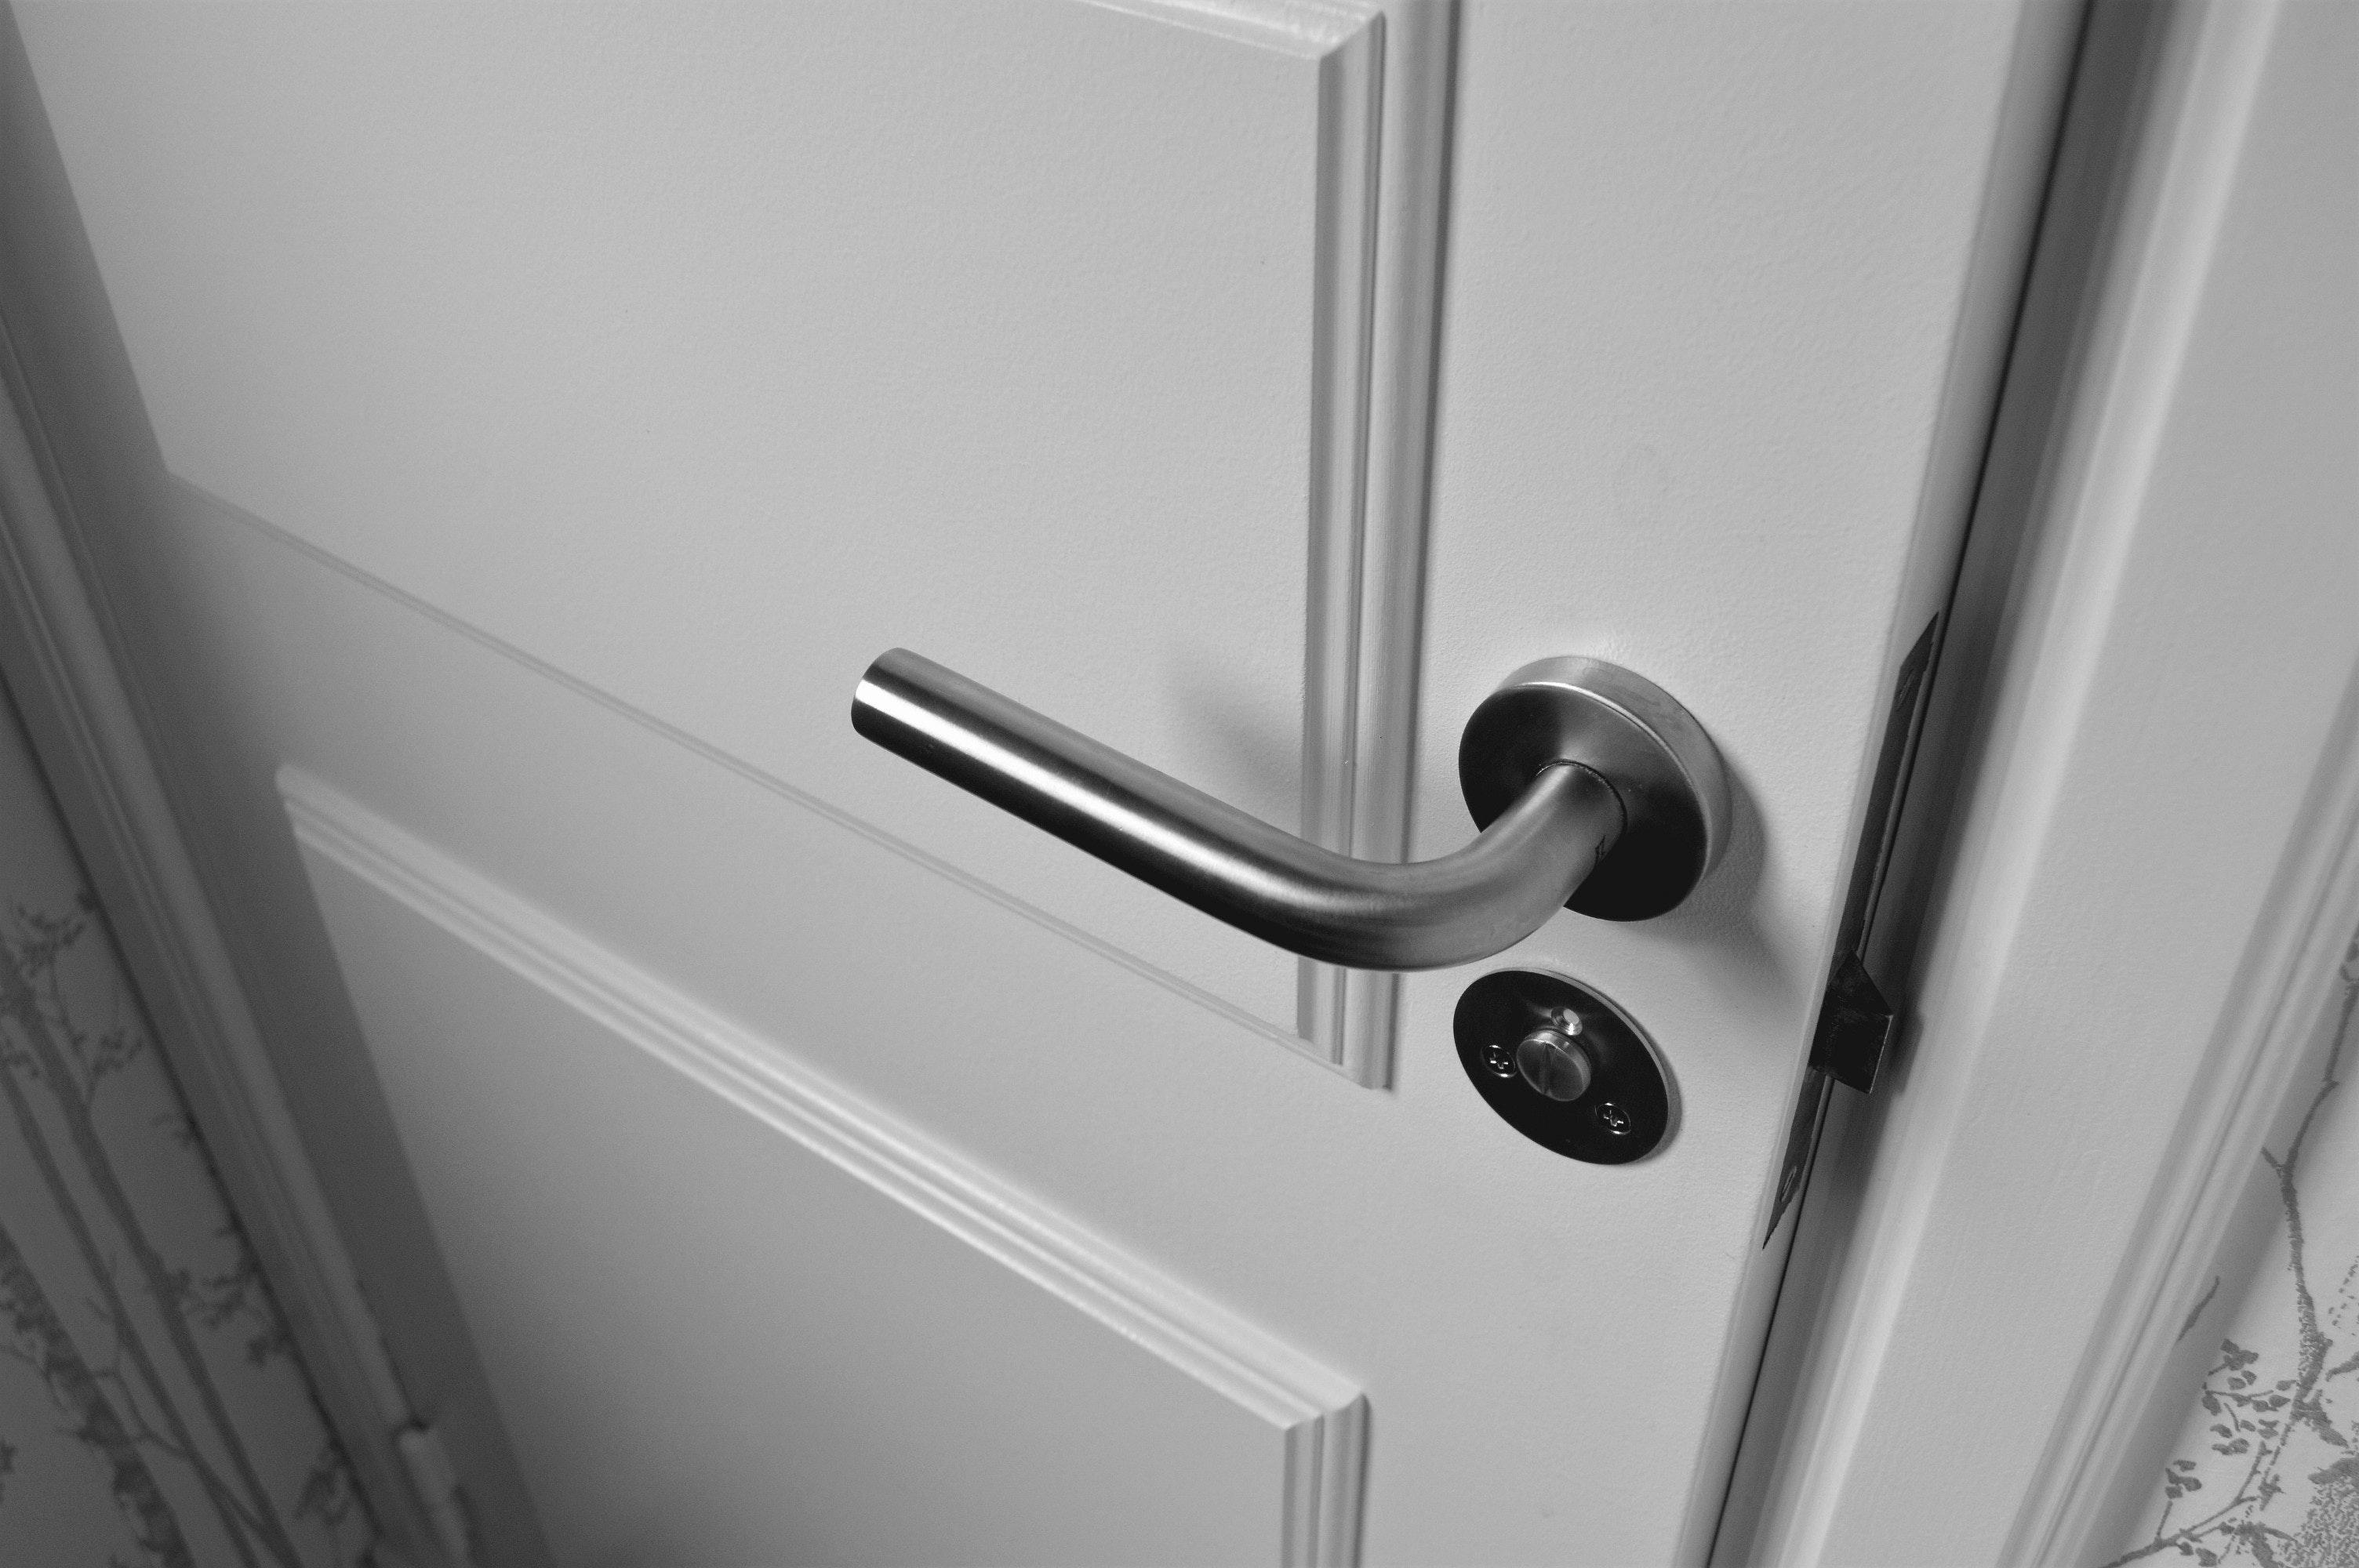 Semi Open White Wooden Door, Access, Lock, Wood, Wallpaper, HQ Photo